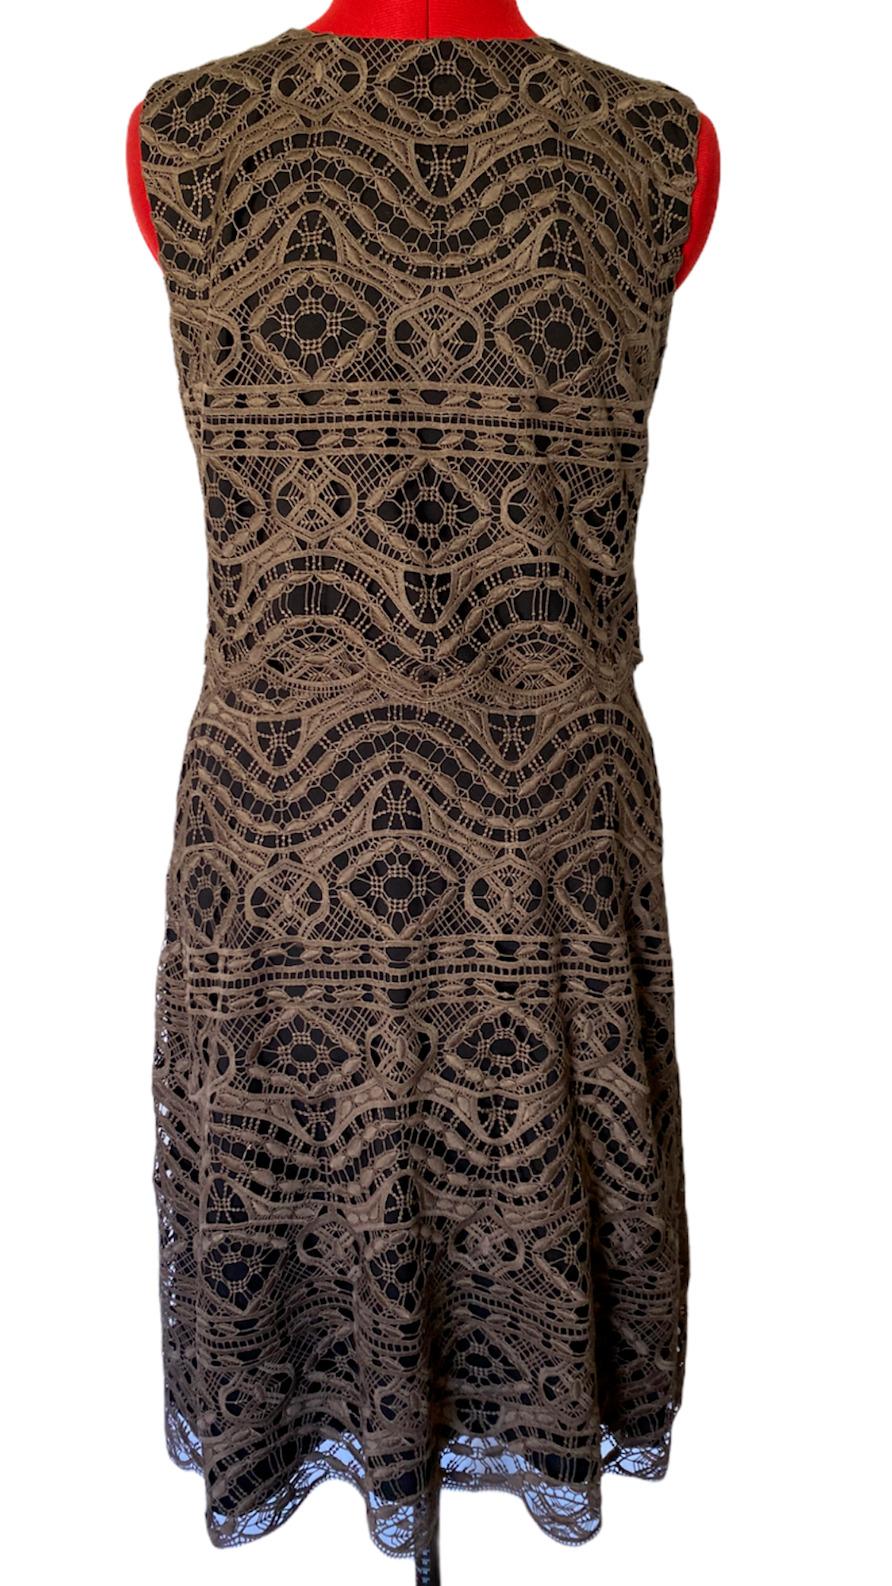 ANTHROPOLOGIE NWT BHLDN Embroidered Dress BEIGE /& BLUE FLORAL SHEATH Sz 6